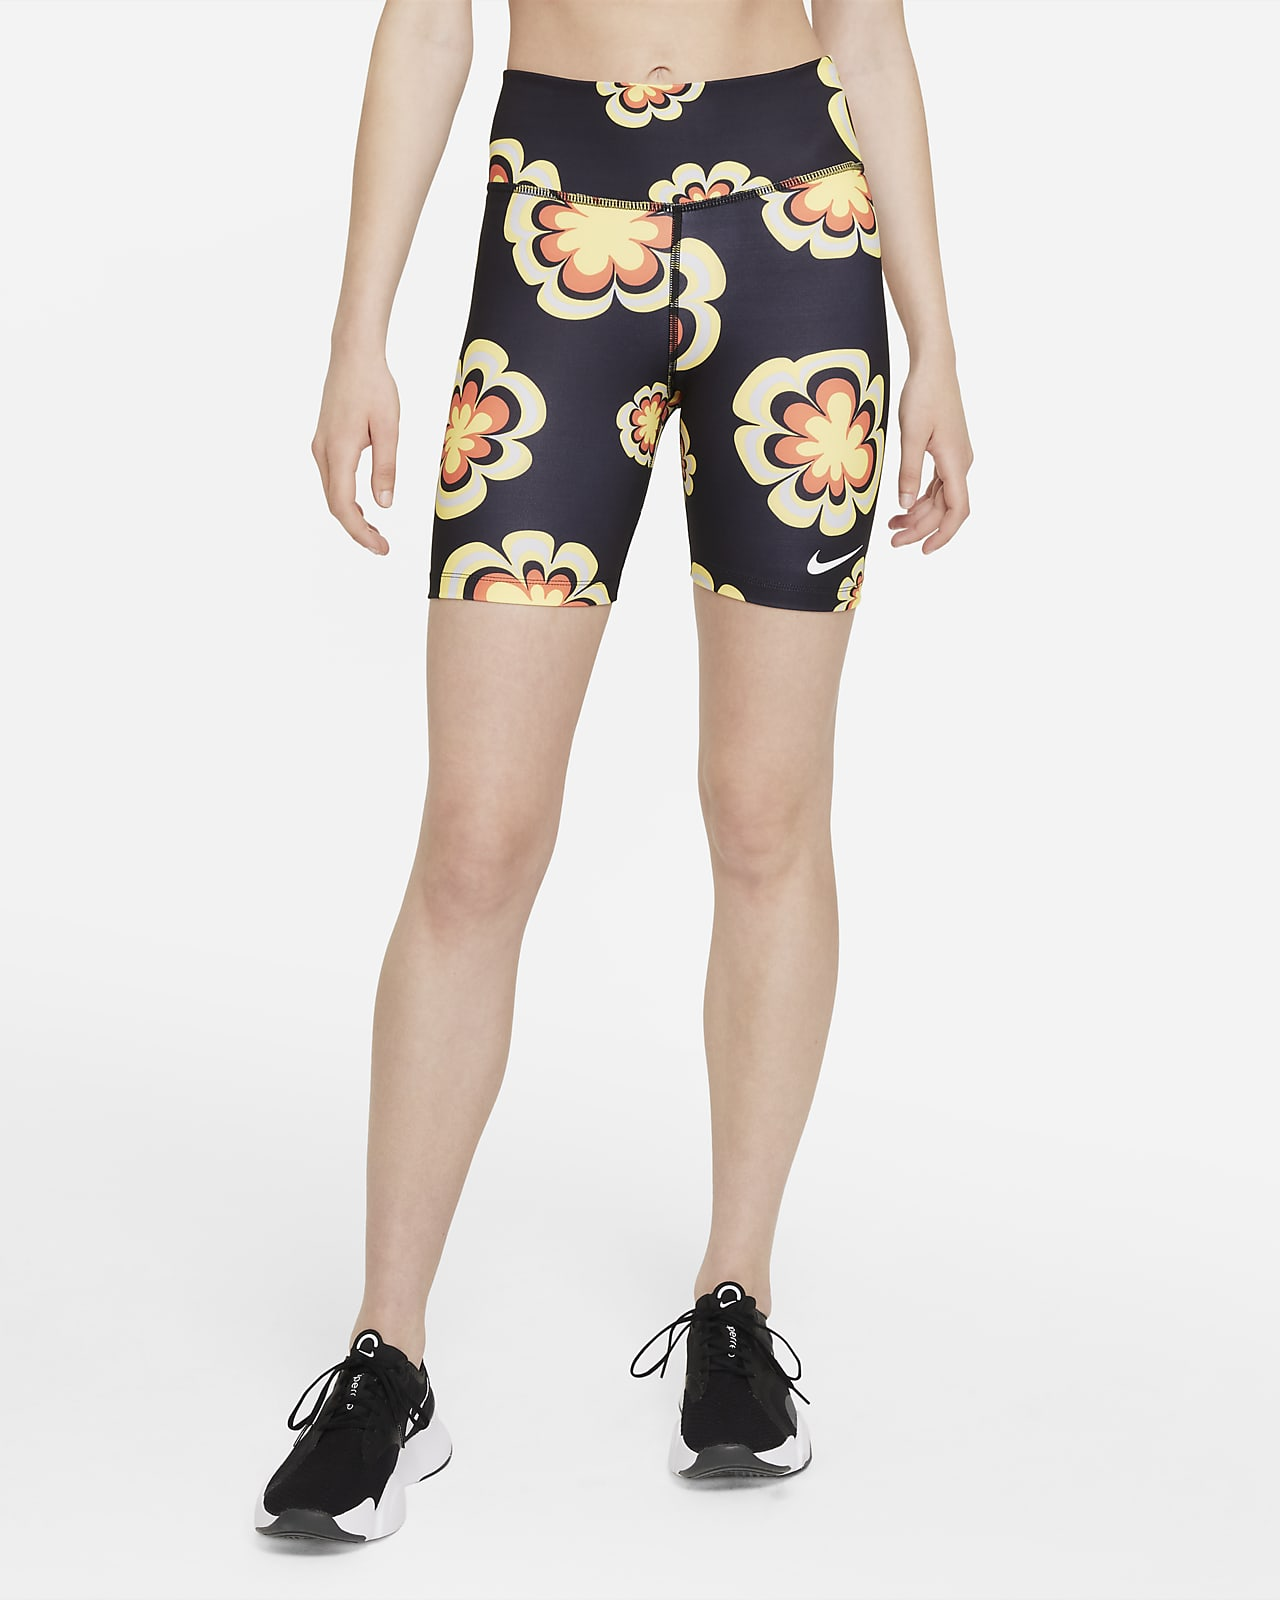 Shorts de 18 cm para mujer Nike One